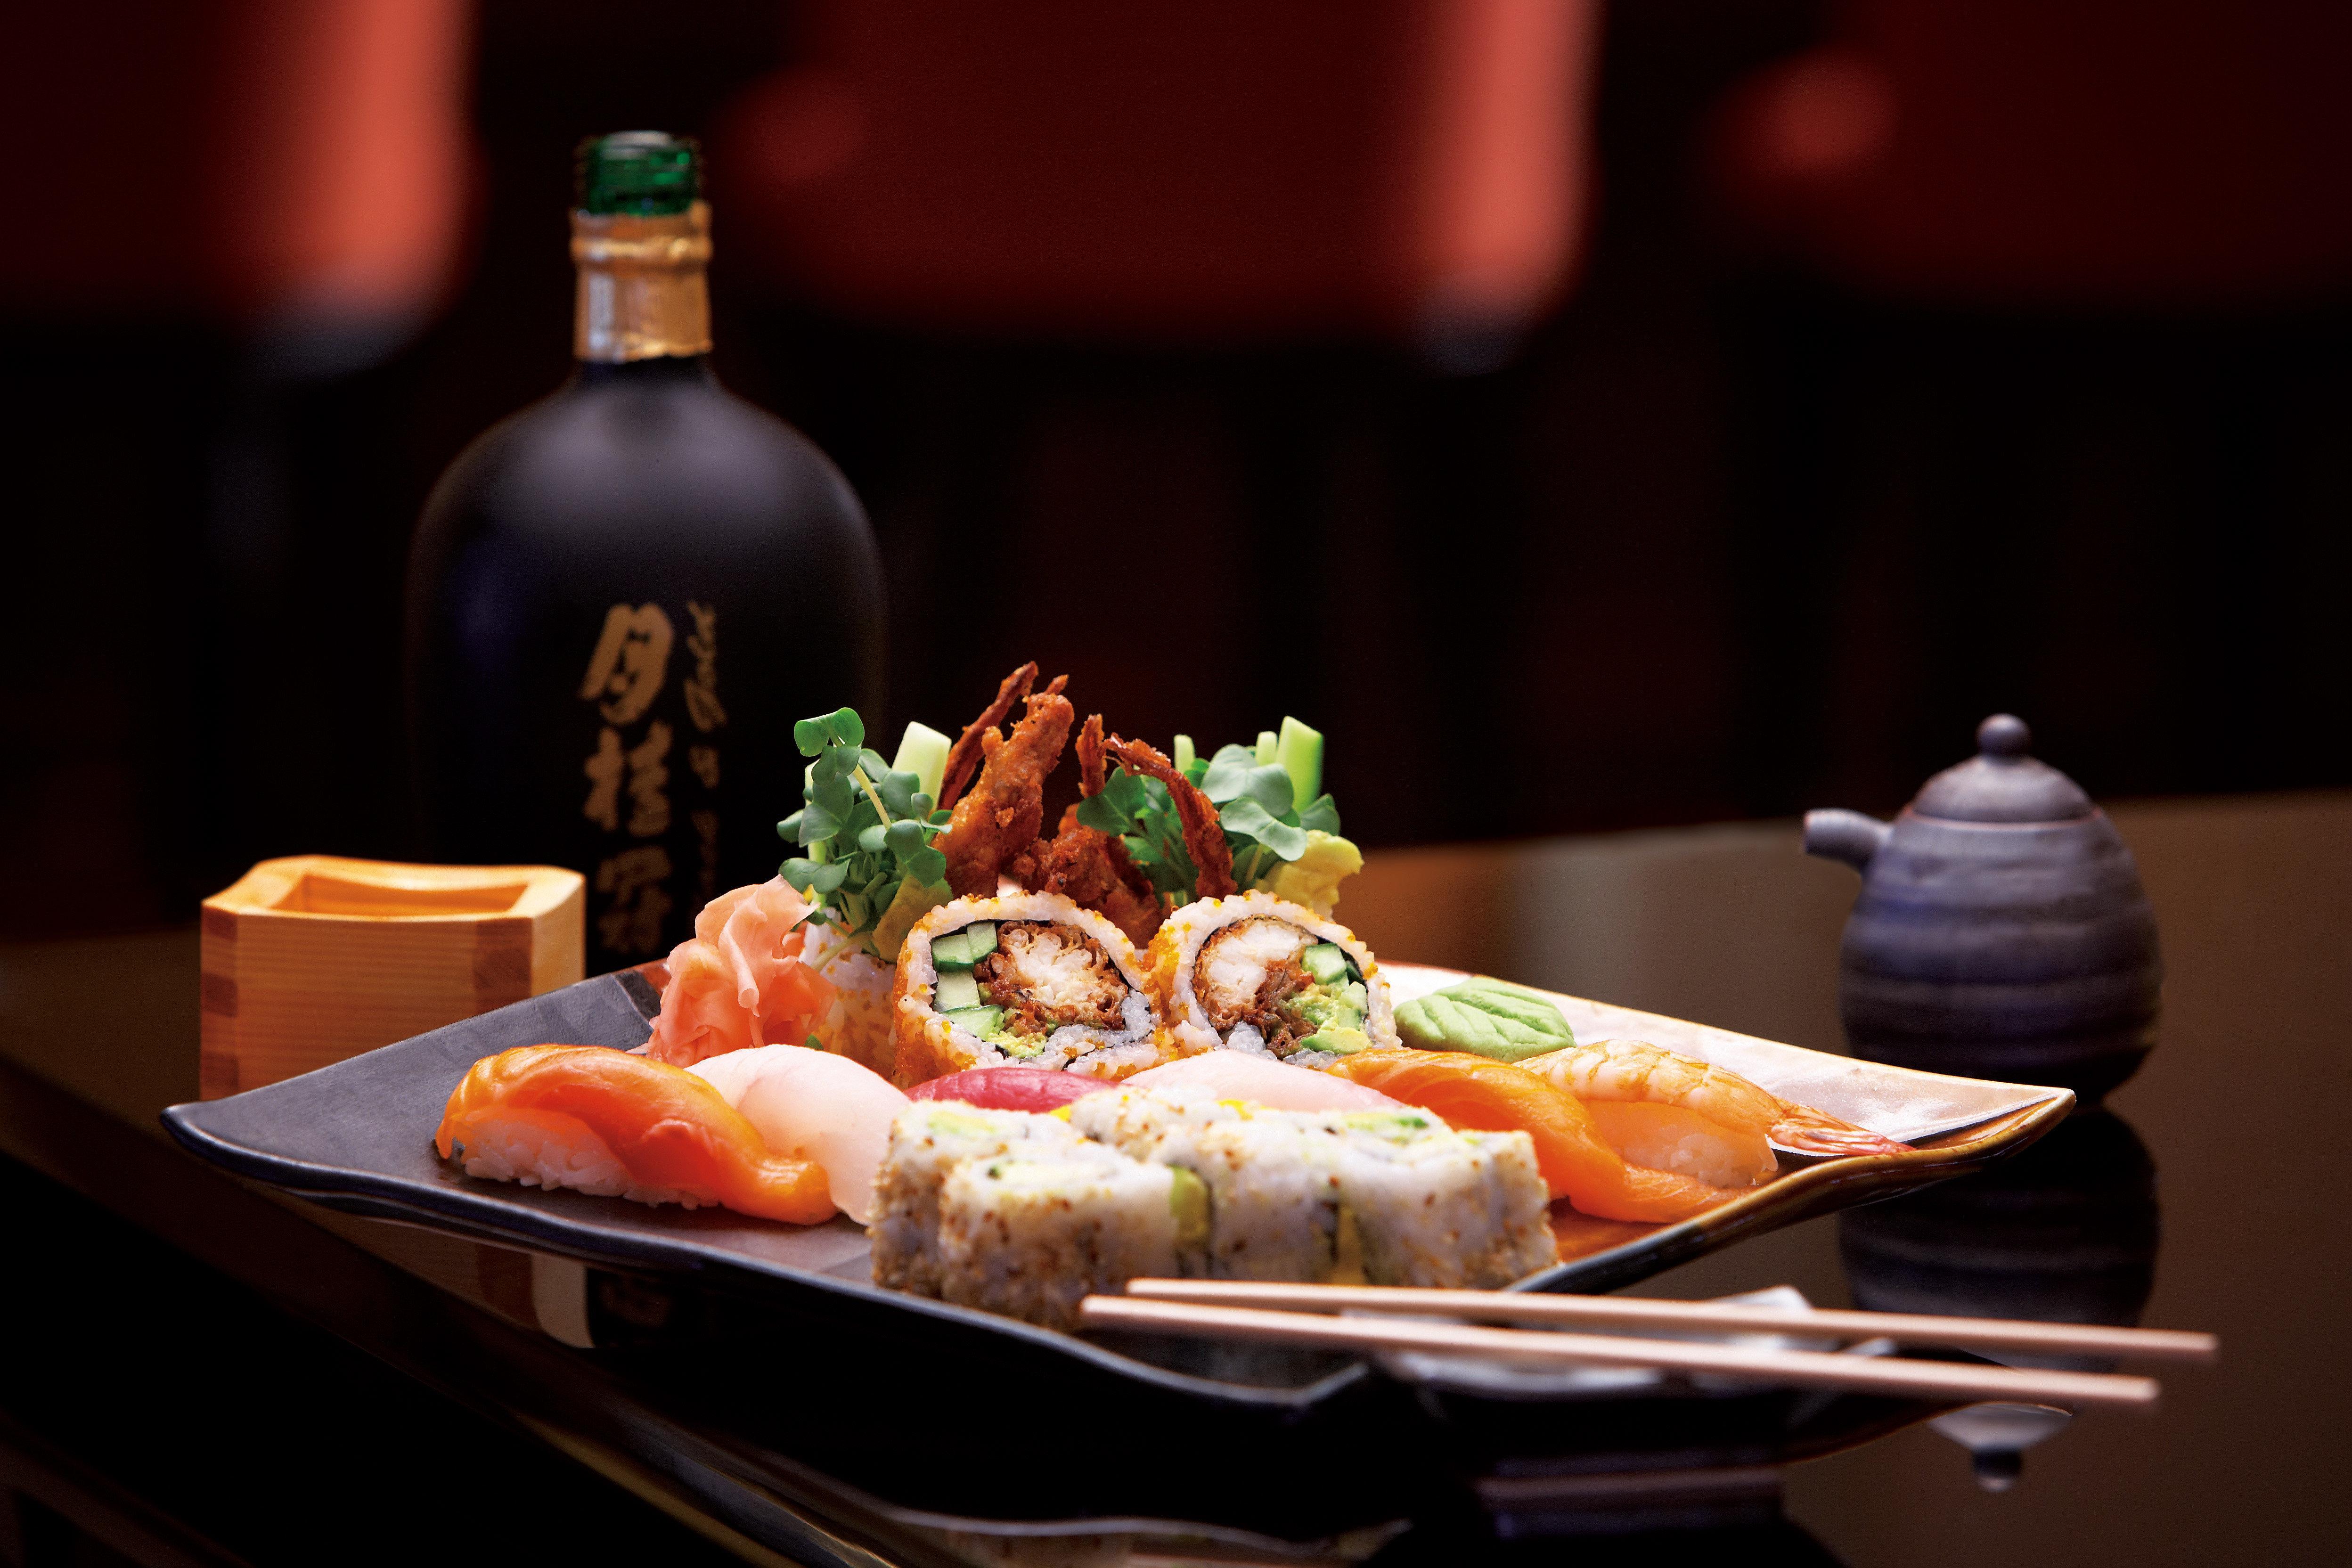 Dining Drink Eat food plate cuisine restaurant asian food Seafood sense dinner